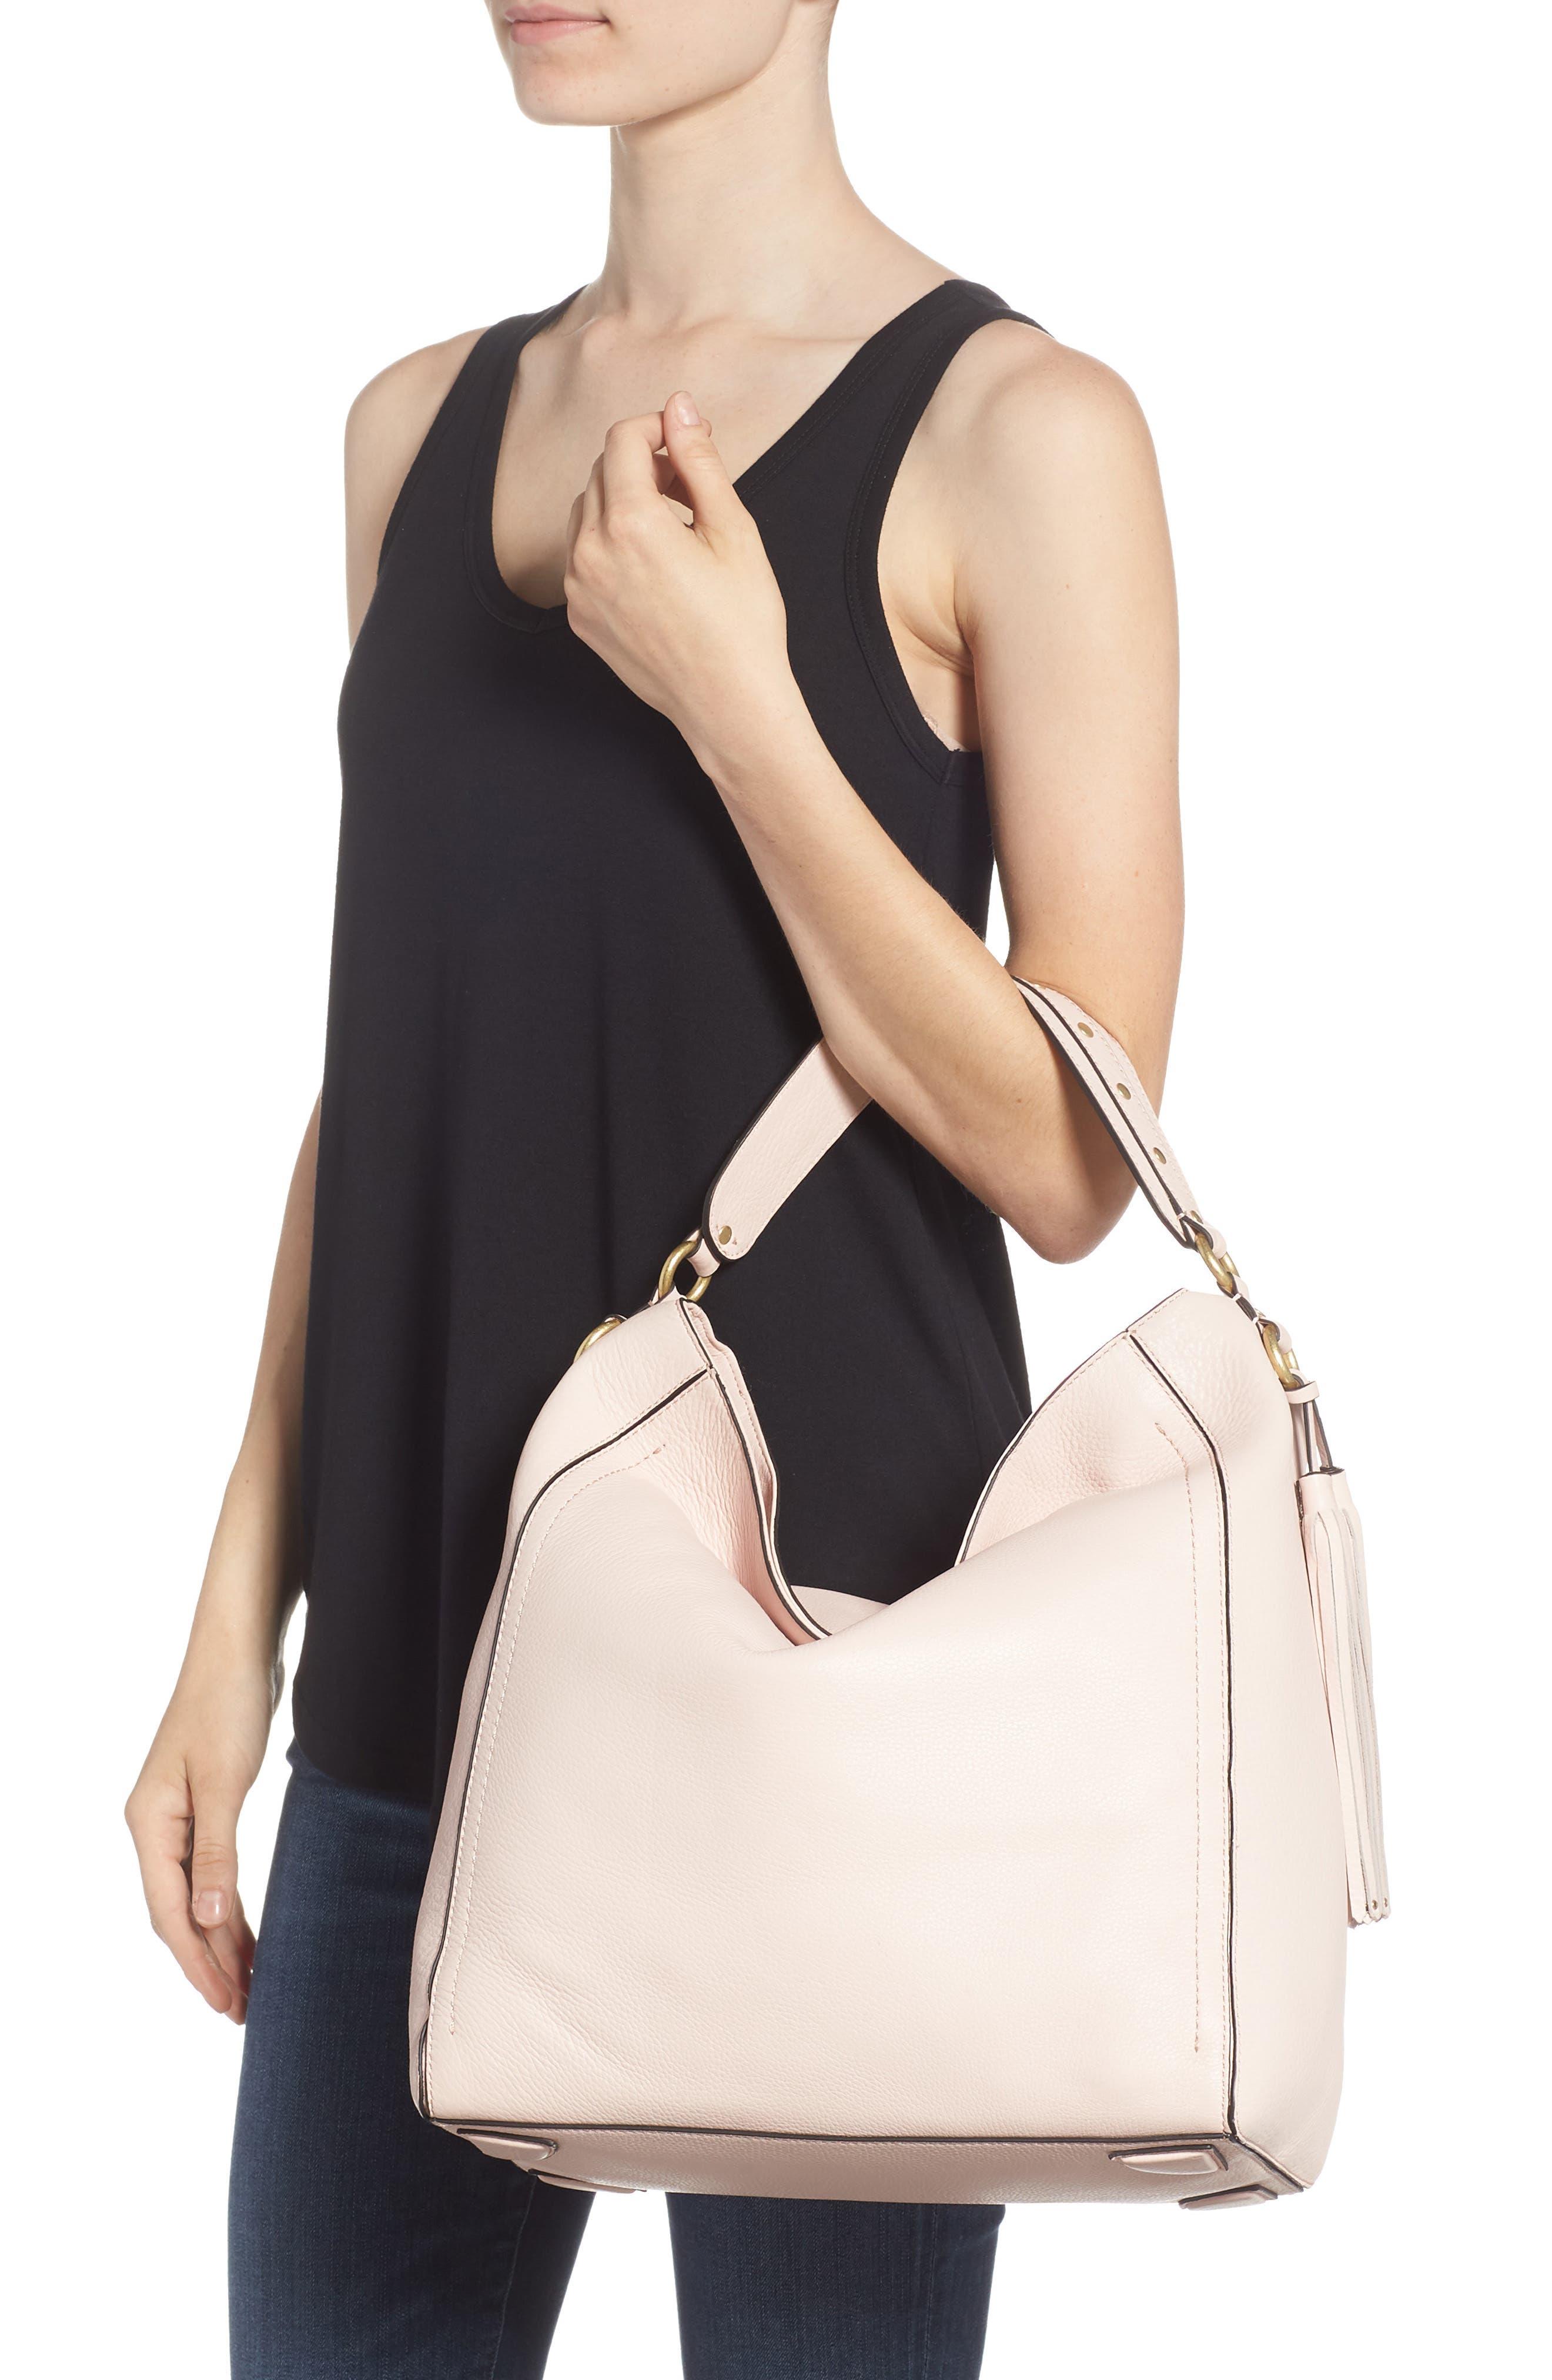 Cassidy RFID Pebbled Leather Bucket Bag,                             Alternate thumbnail 8, color,